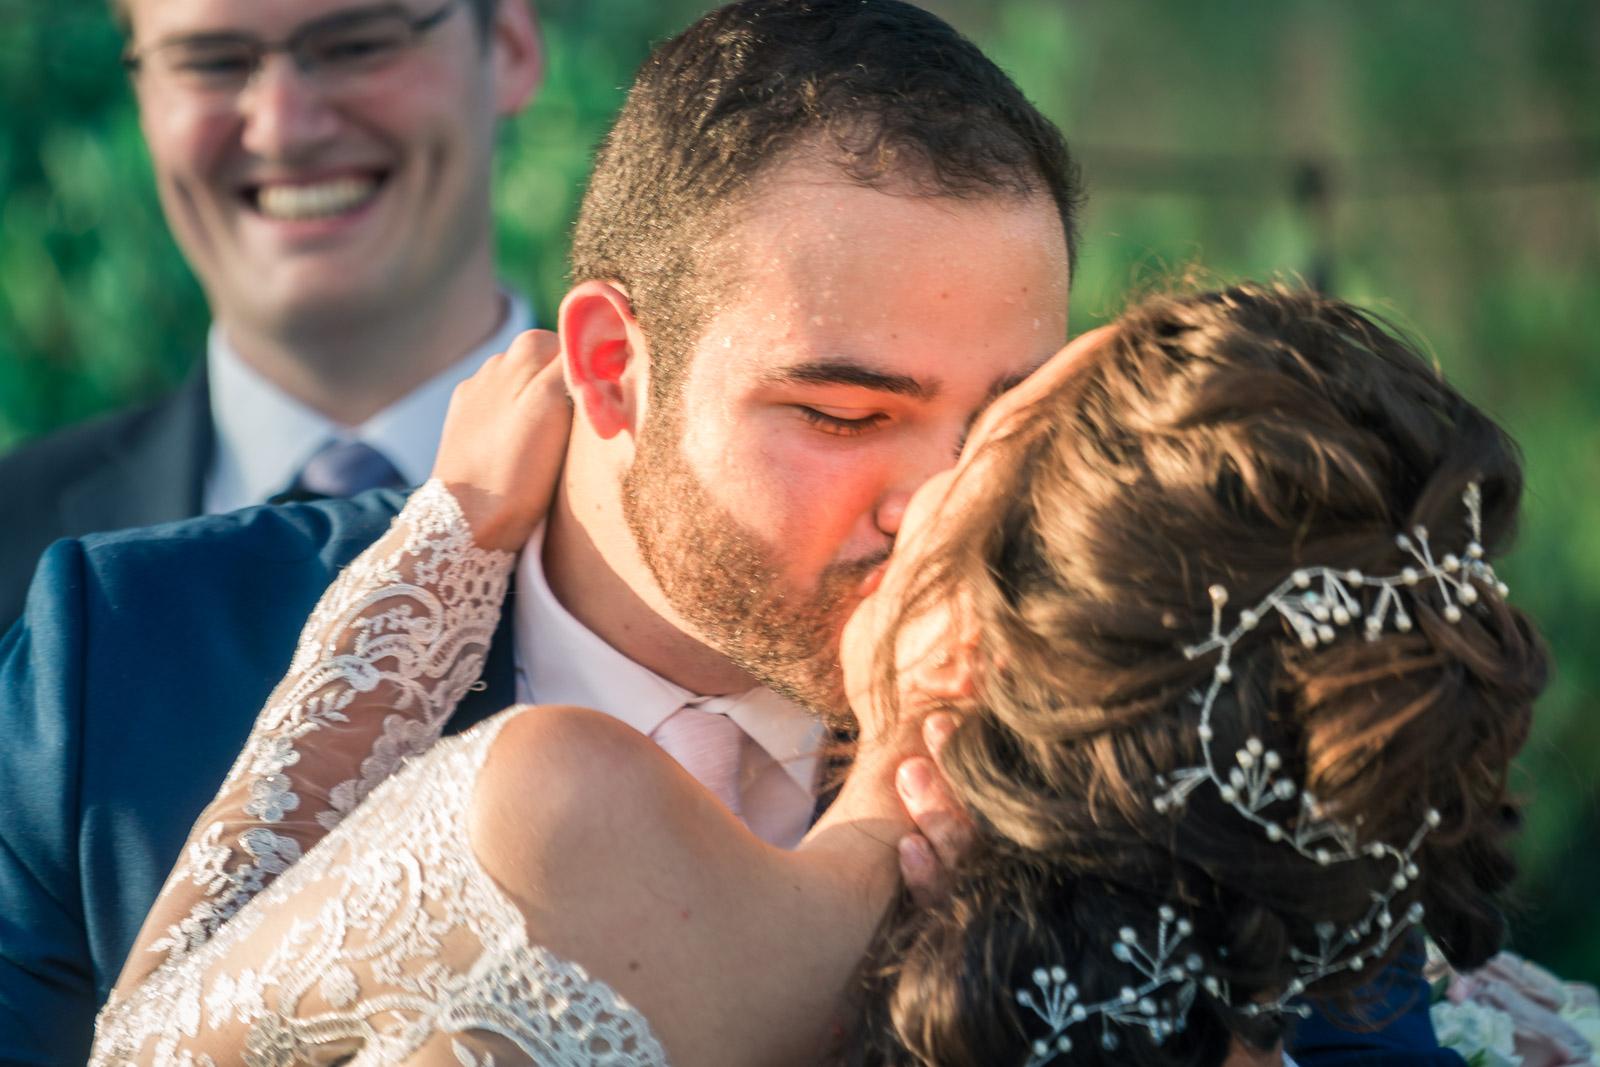 254_Angel-Brea-Orange-County_Joseph-Barber-Wedding-Photography.jpg